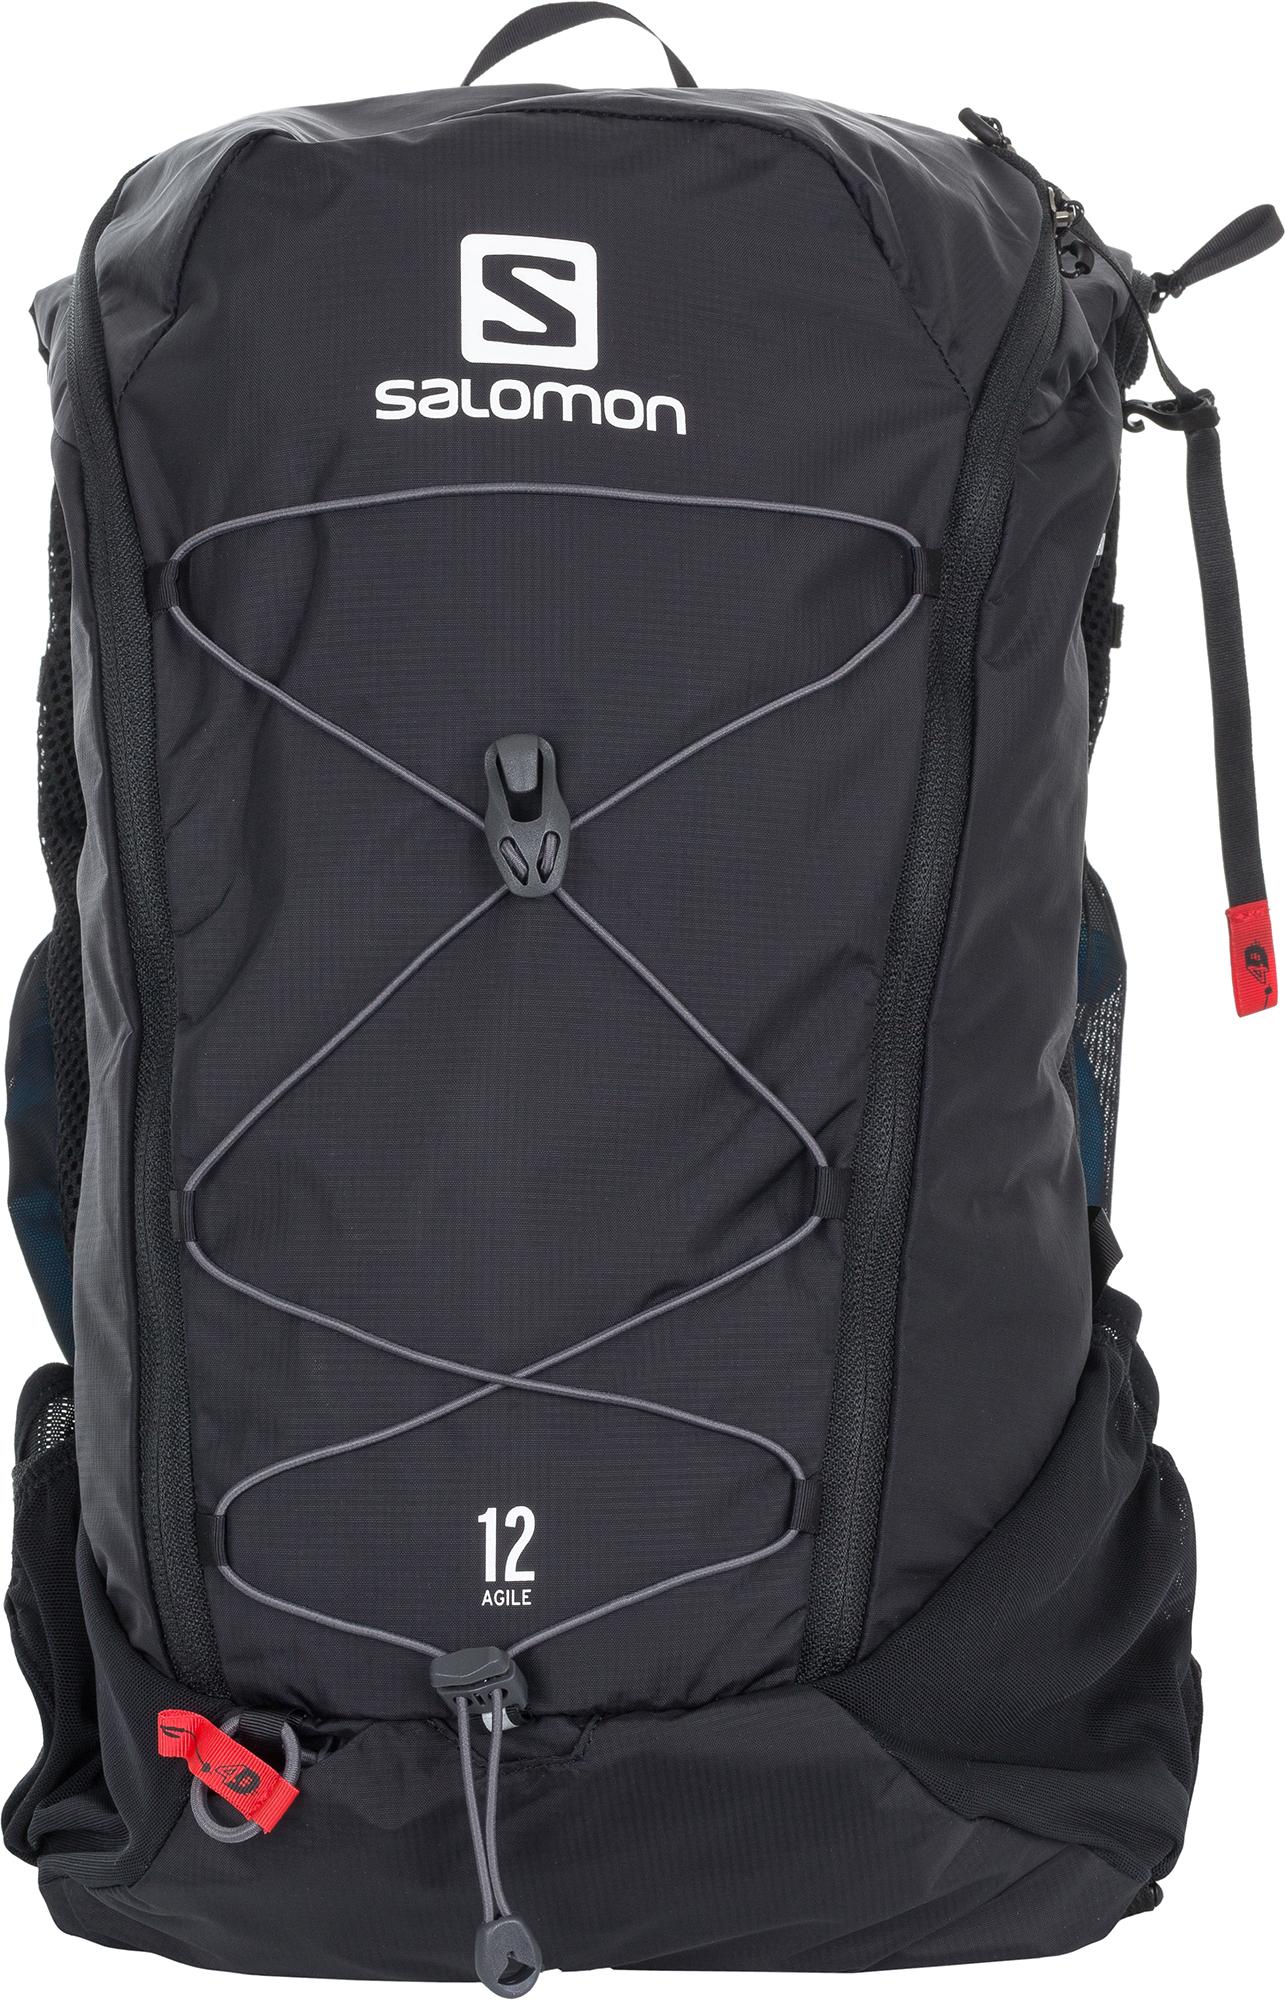 Salomon Рюкзак Agile 12